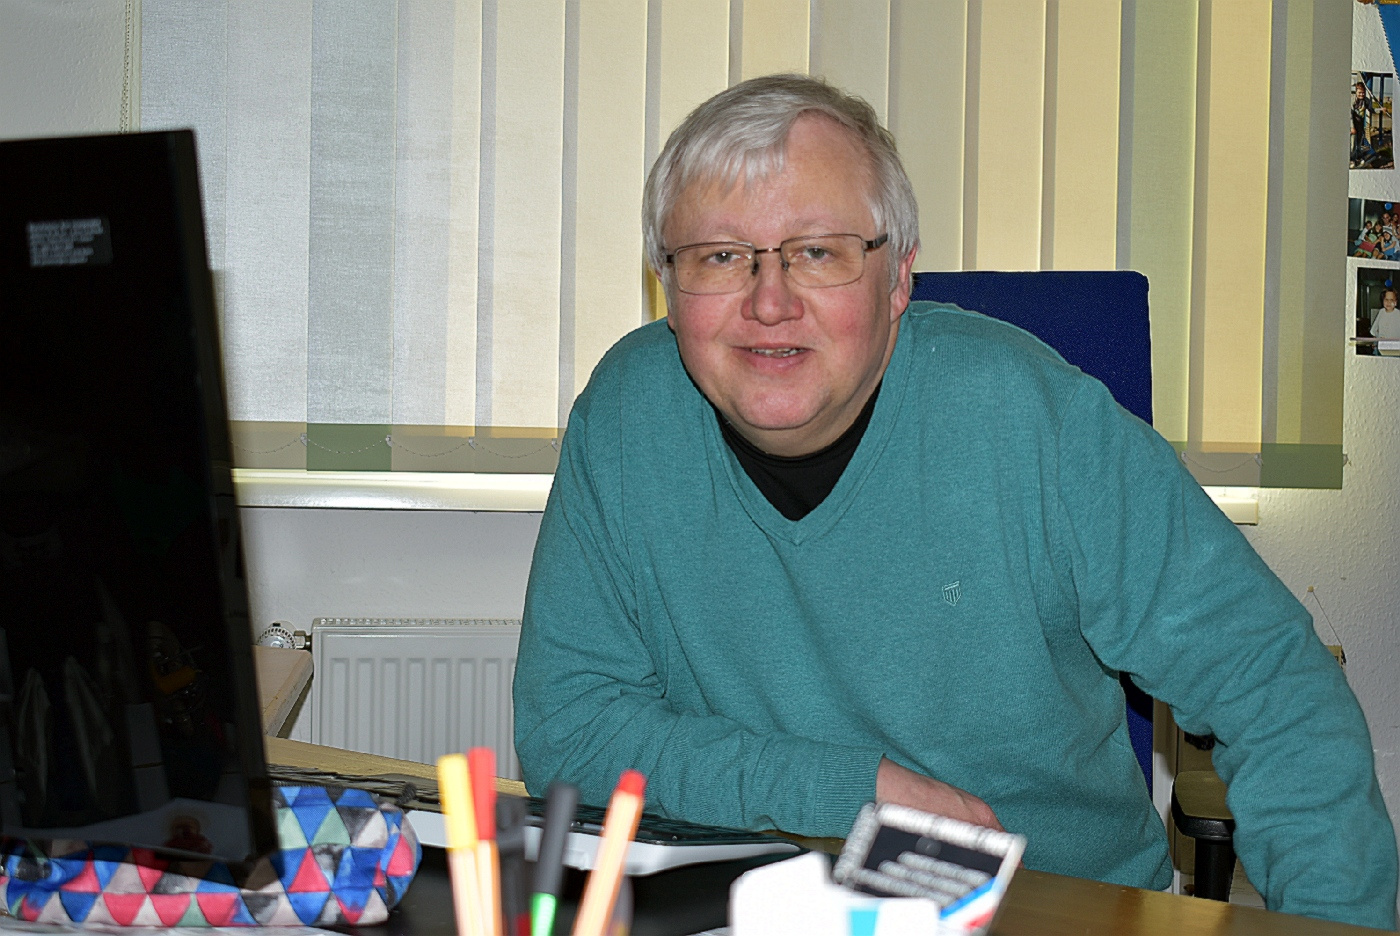 Pfarrer Schmidt im Homeoffice